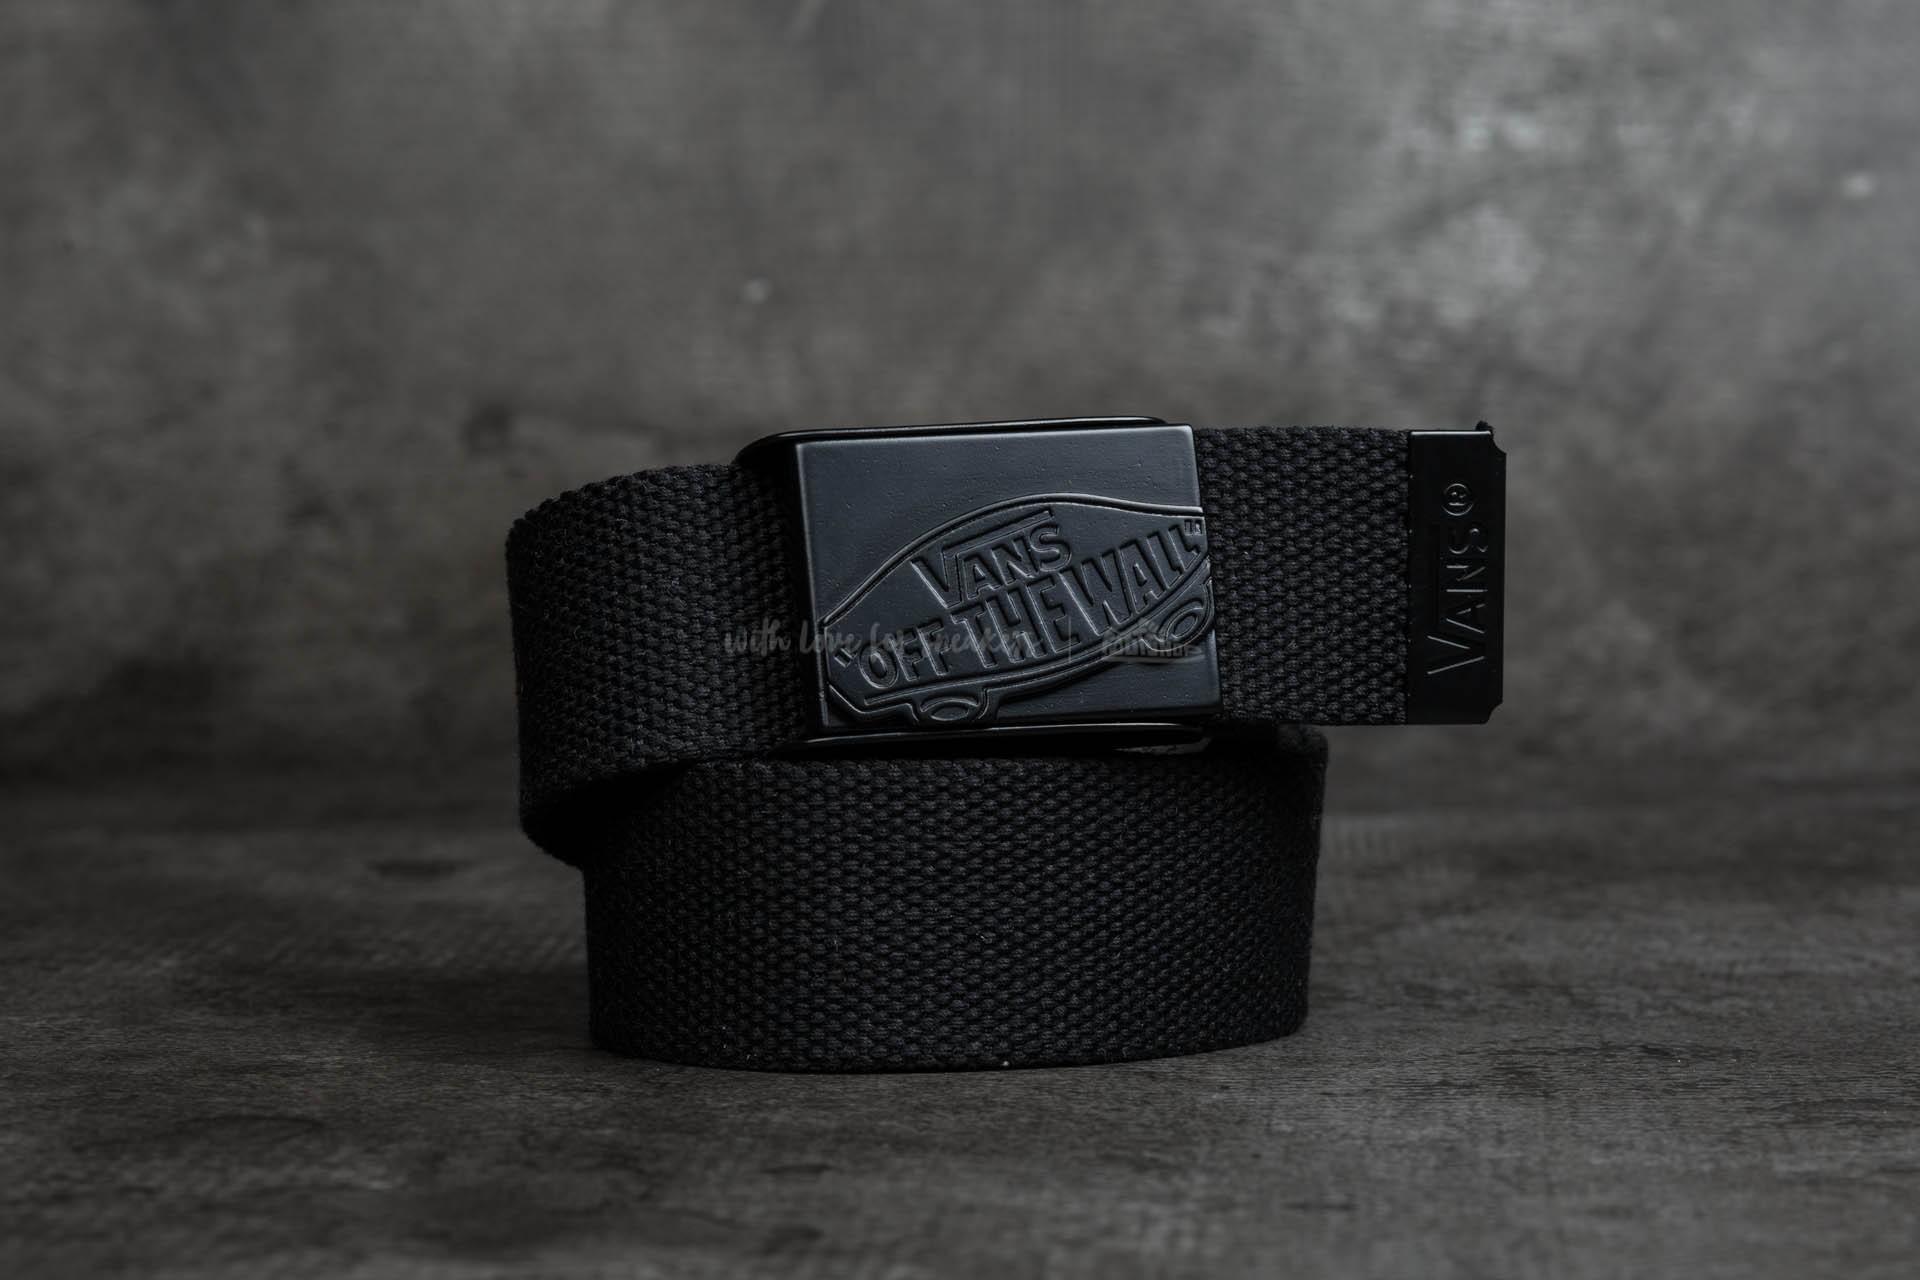 e7c8342ac5ed1a Vans Conductor Web Belt Black